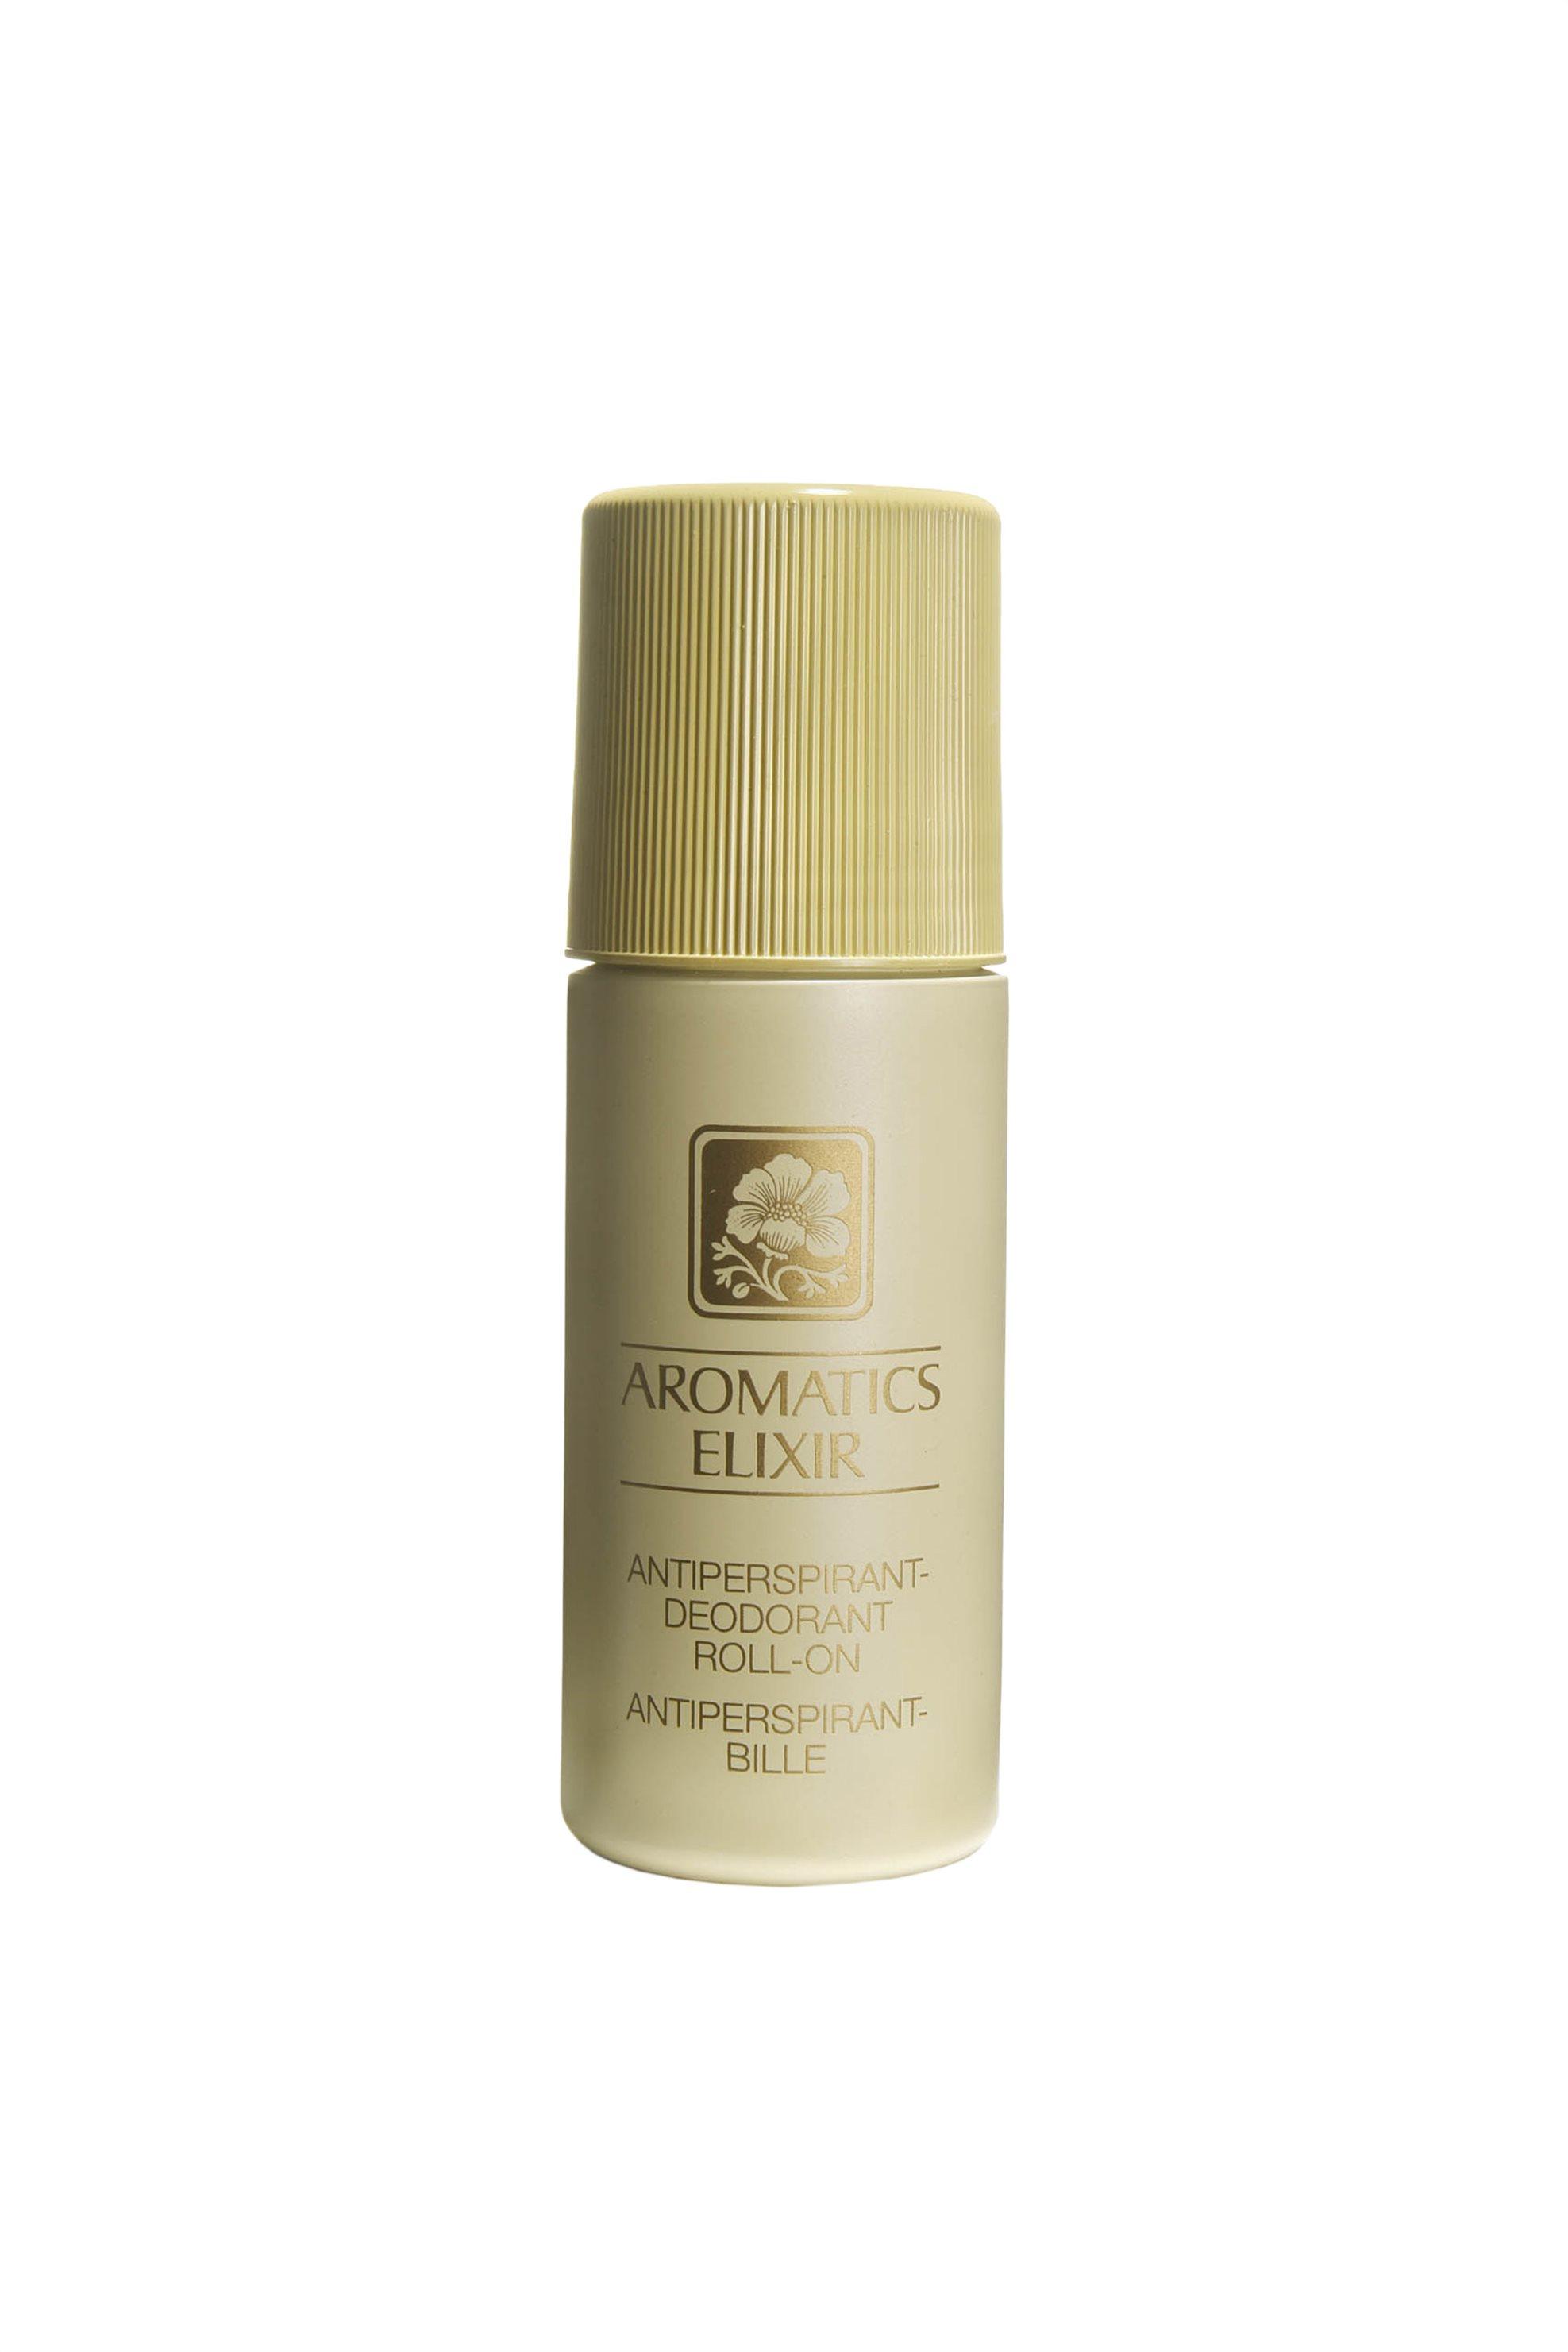 Clinique Aromatics Elixir Antiperspirant Deodorant Roll-Οn 75 ml - 6C1W010000 ομορφια   καλλυντικα επιλεκτικησ   αρώματα   γυναικεία αρώματα   body